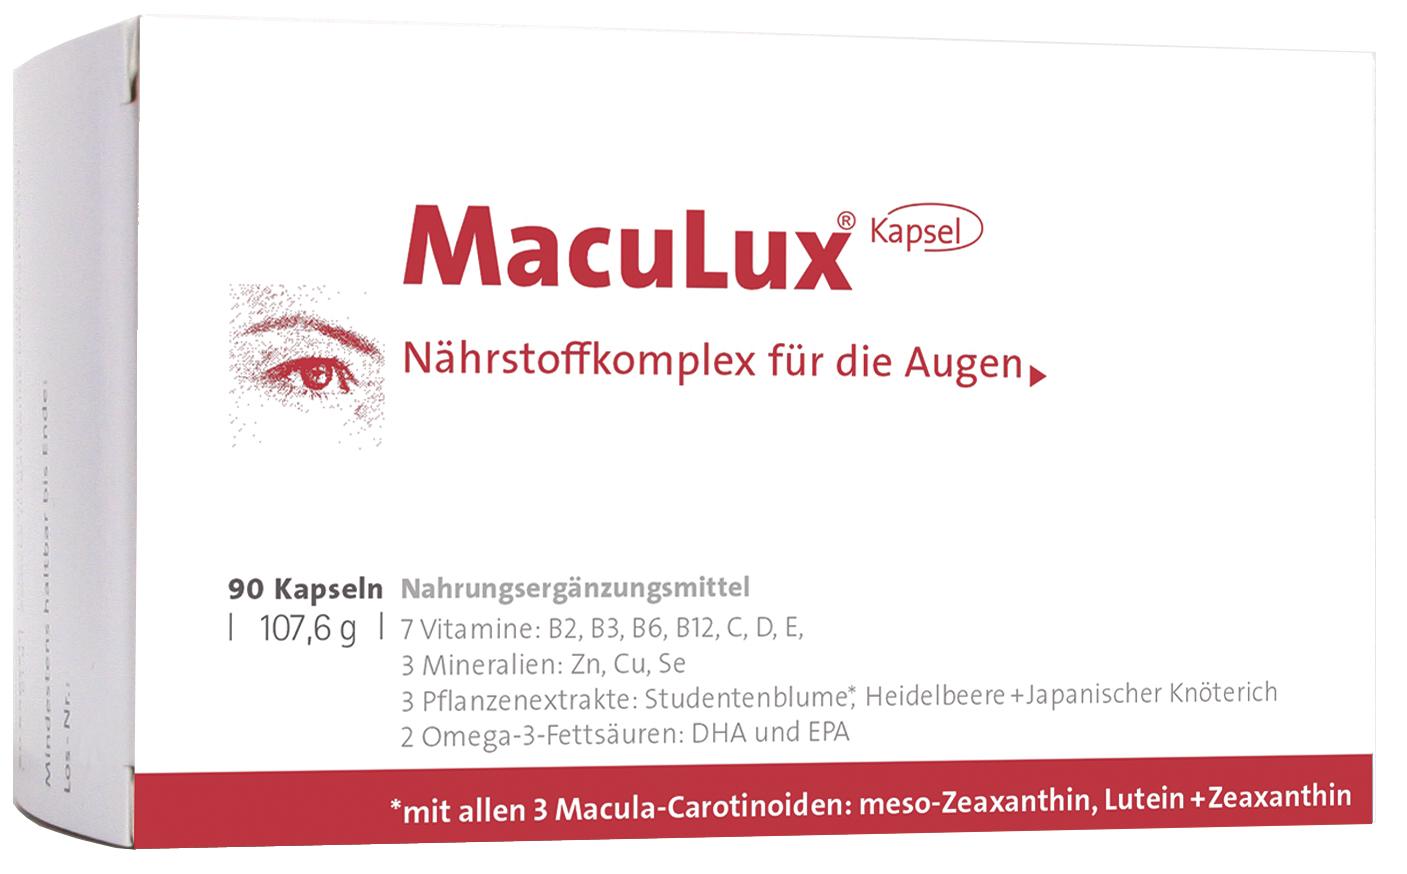 MacuLux®-Kapseln